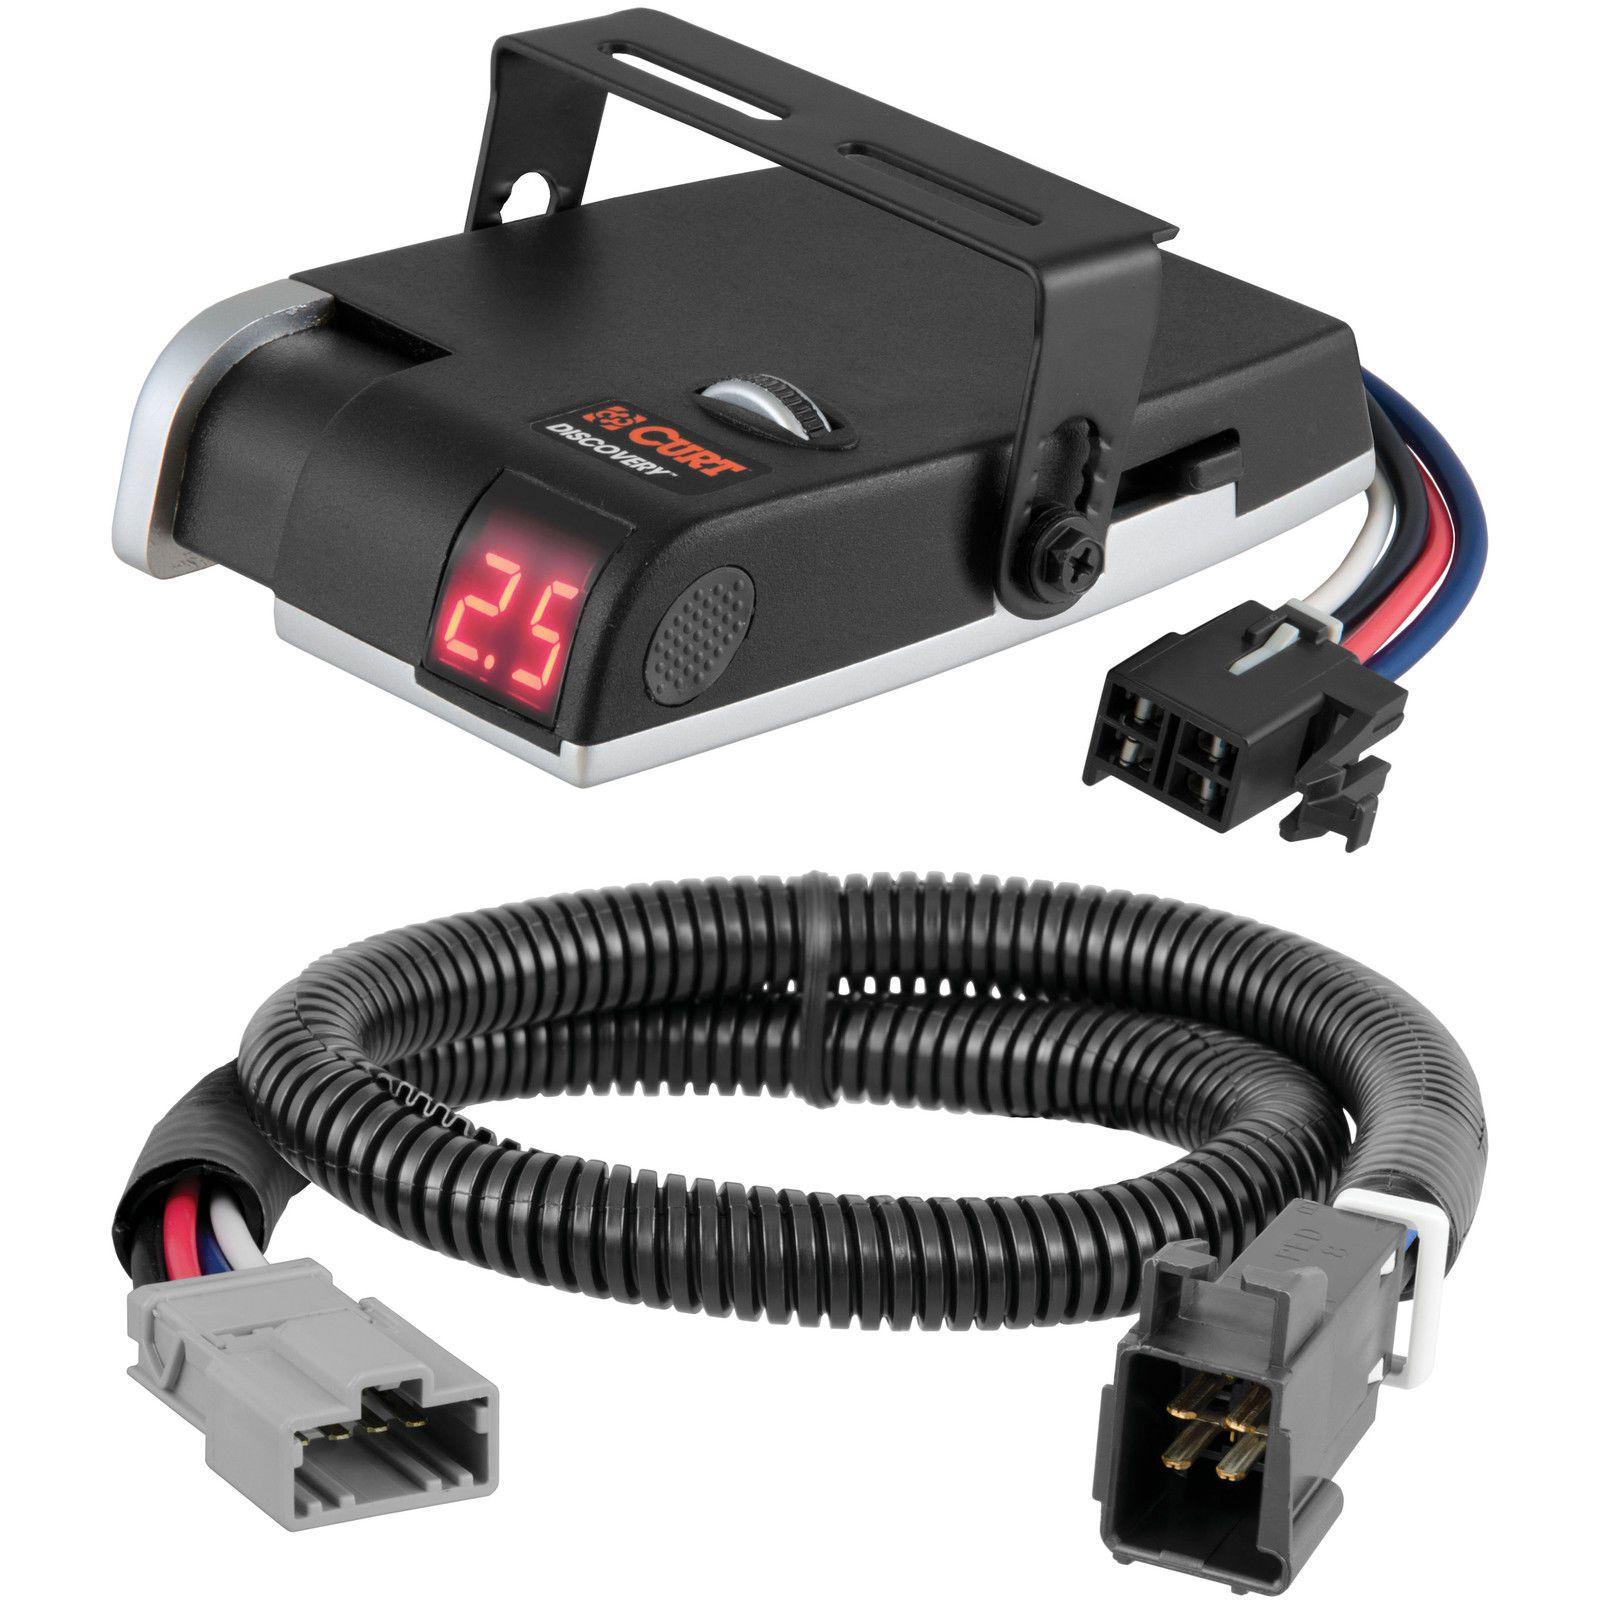 Curt Discovery Brake Controller Wiring Kit For Honda Pilot Ridgeline